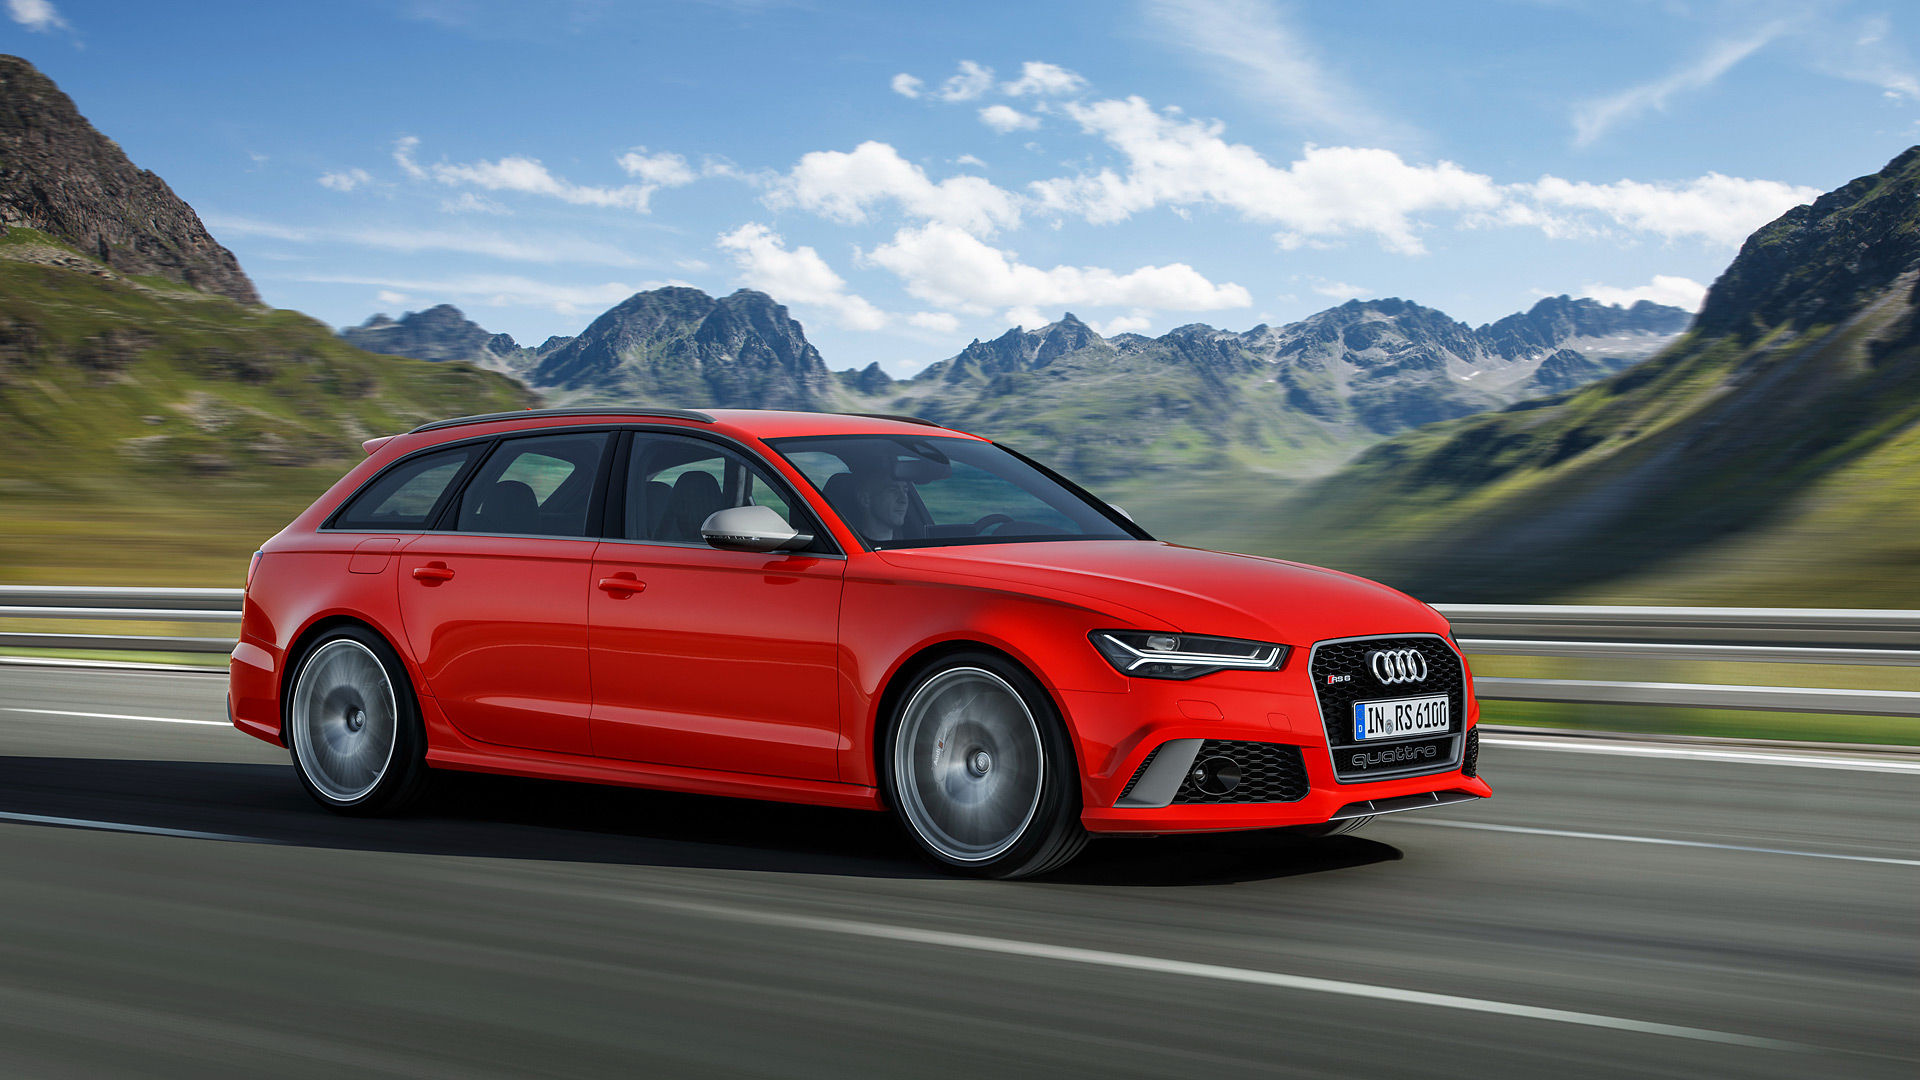 2016 Audi RS6 Avant Performance